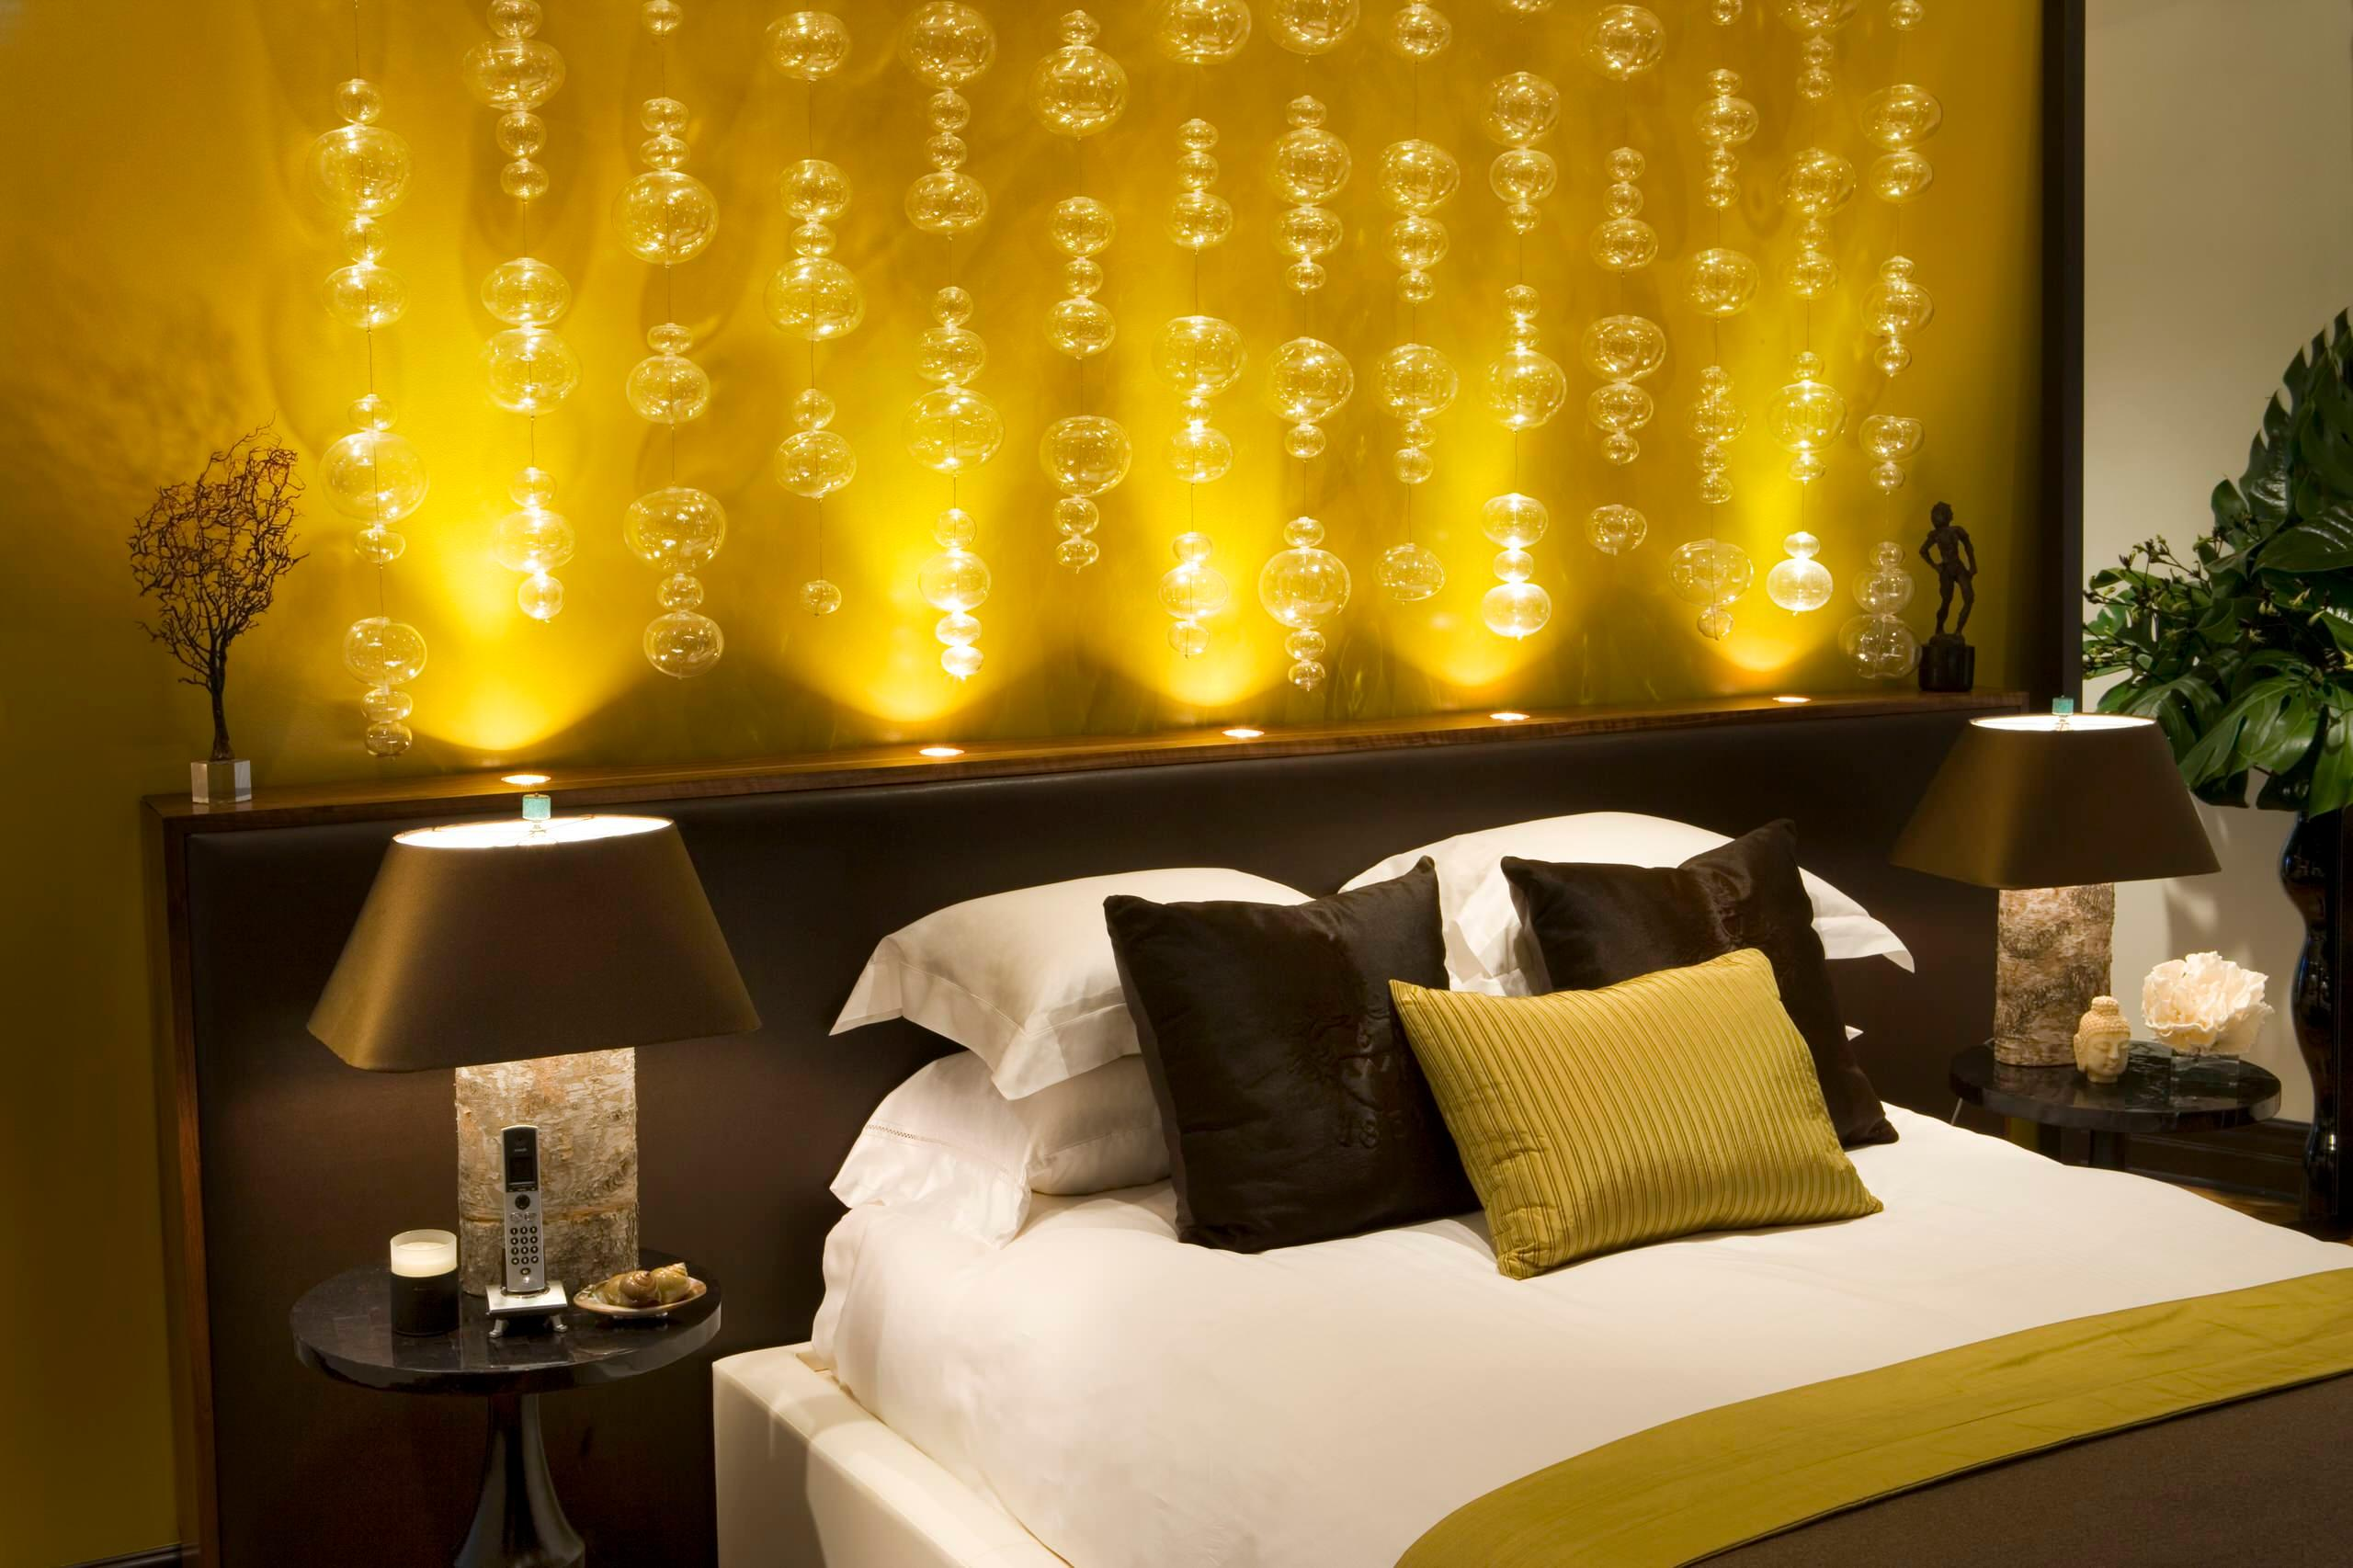 дизайн желтая спальня